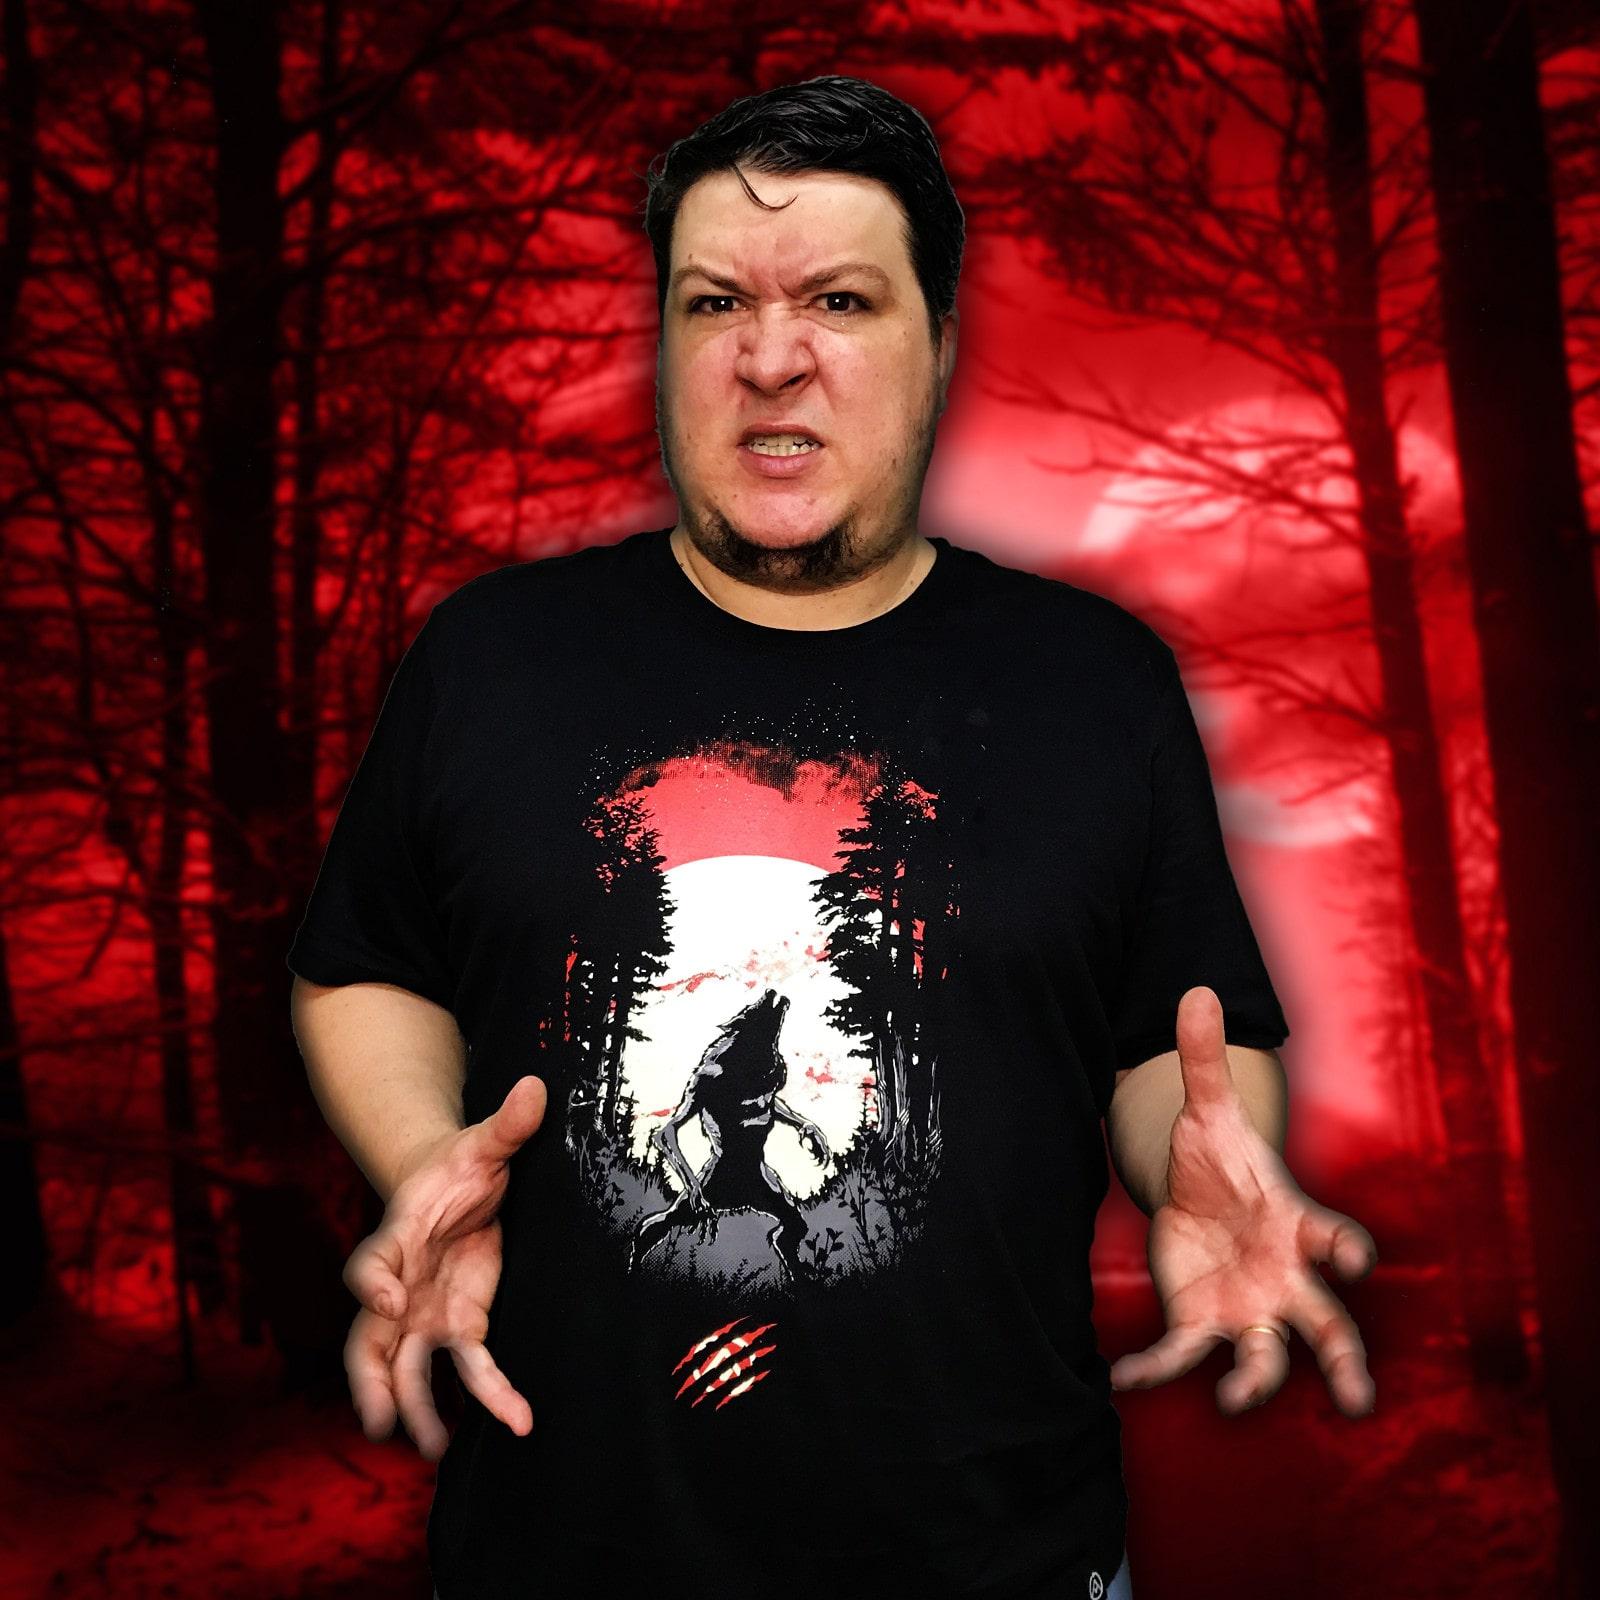 Camiseta Lobisomem (Brilha no Escuro!)